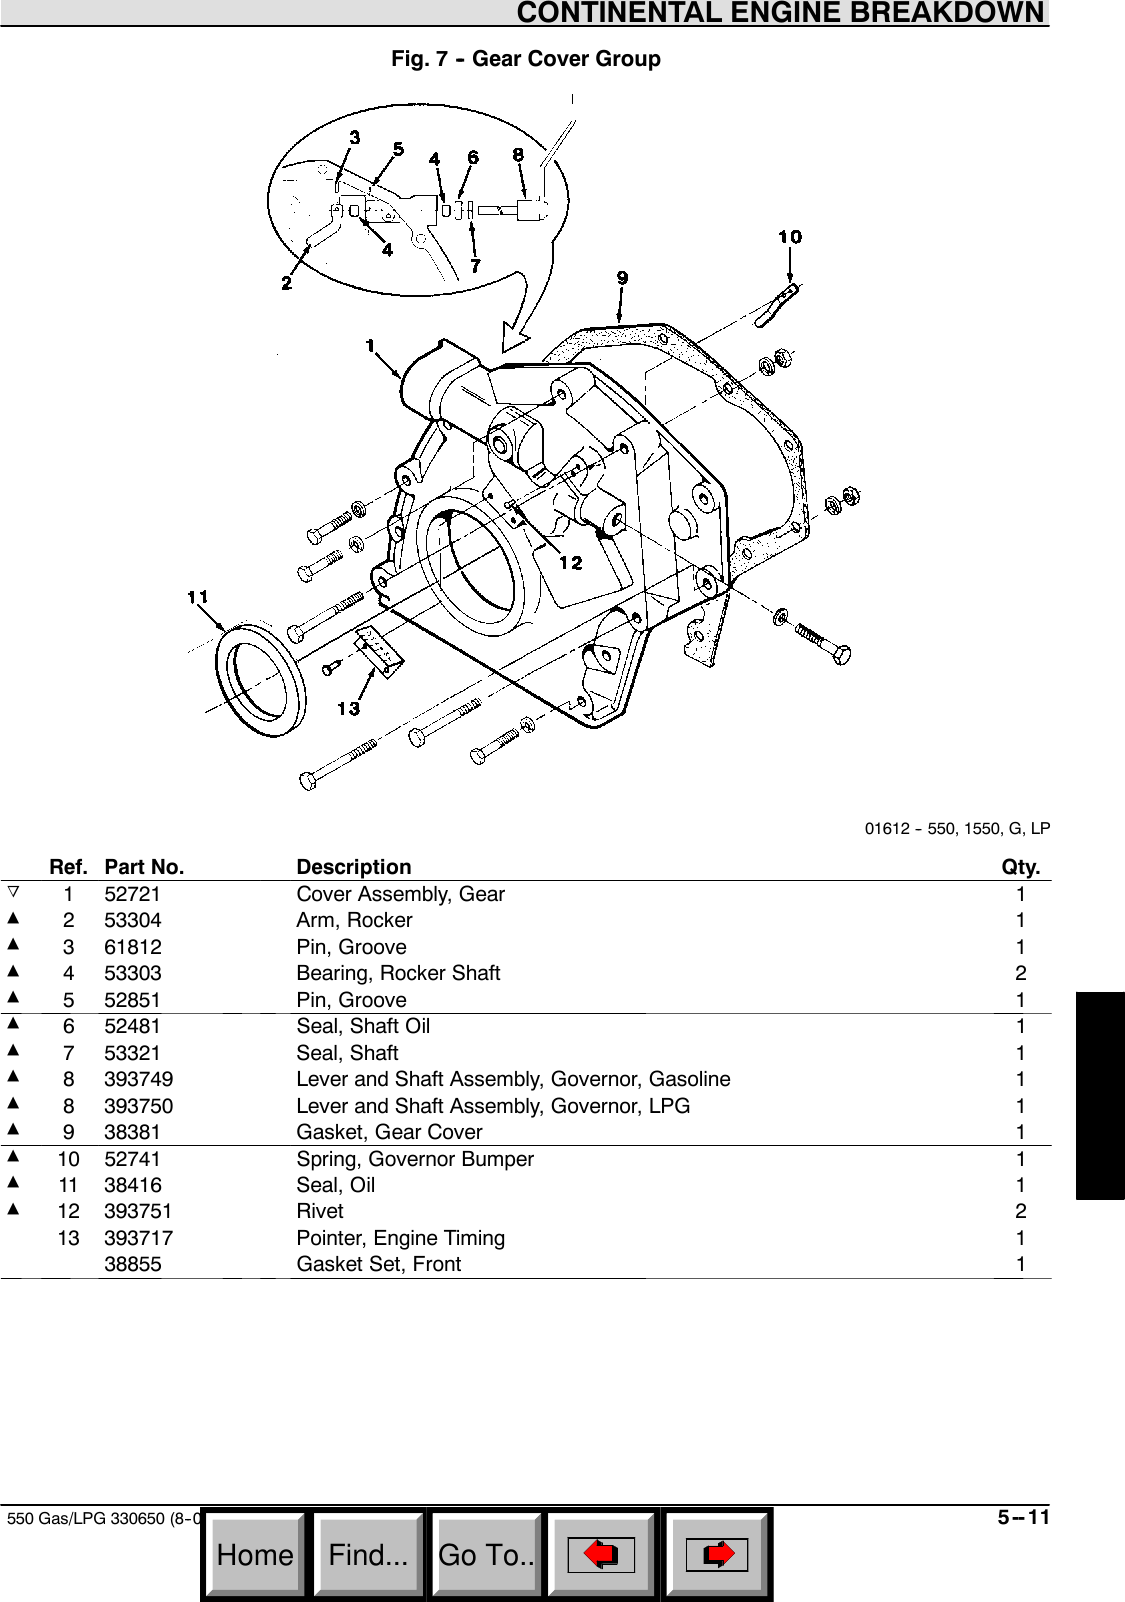 550 Gas/LPG NA Parts Manual Gas LPG Sn 6115 Up